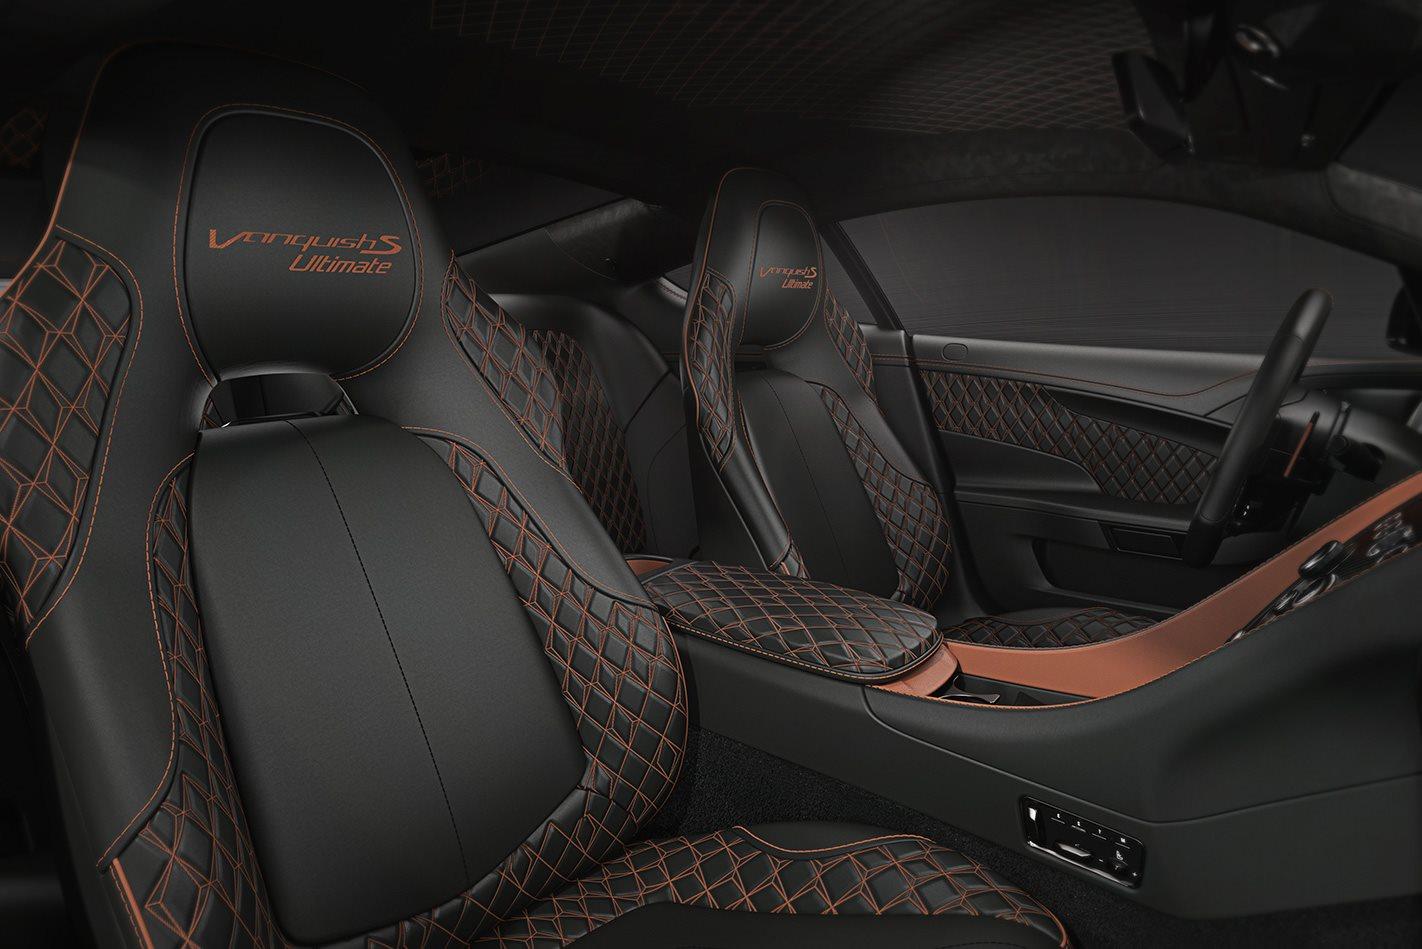 Aston-Martin-Vanquish-Ultimate-interior.jpg